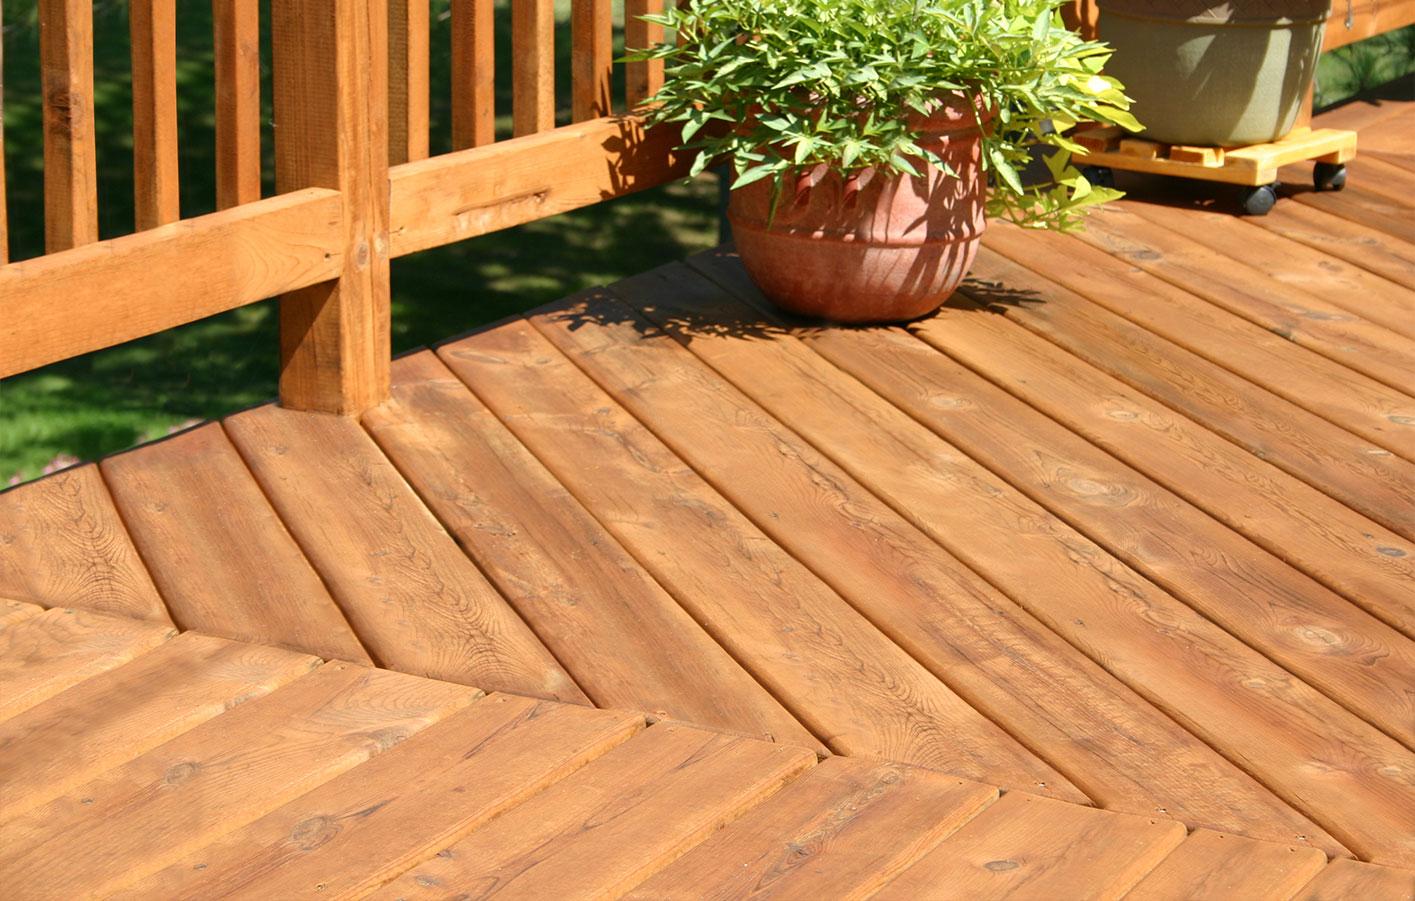 Terrassenbelag Aus Holz WF09 – Hitoiro